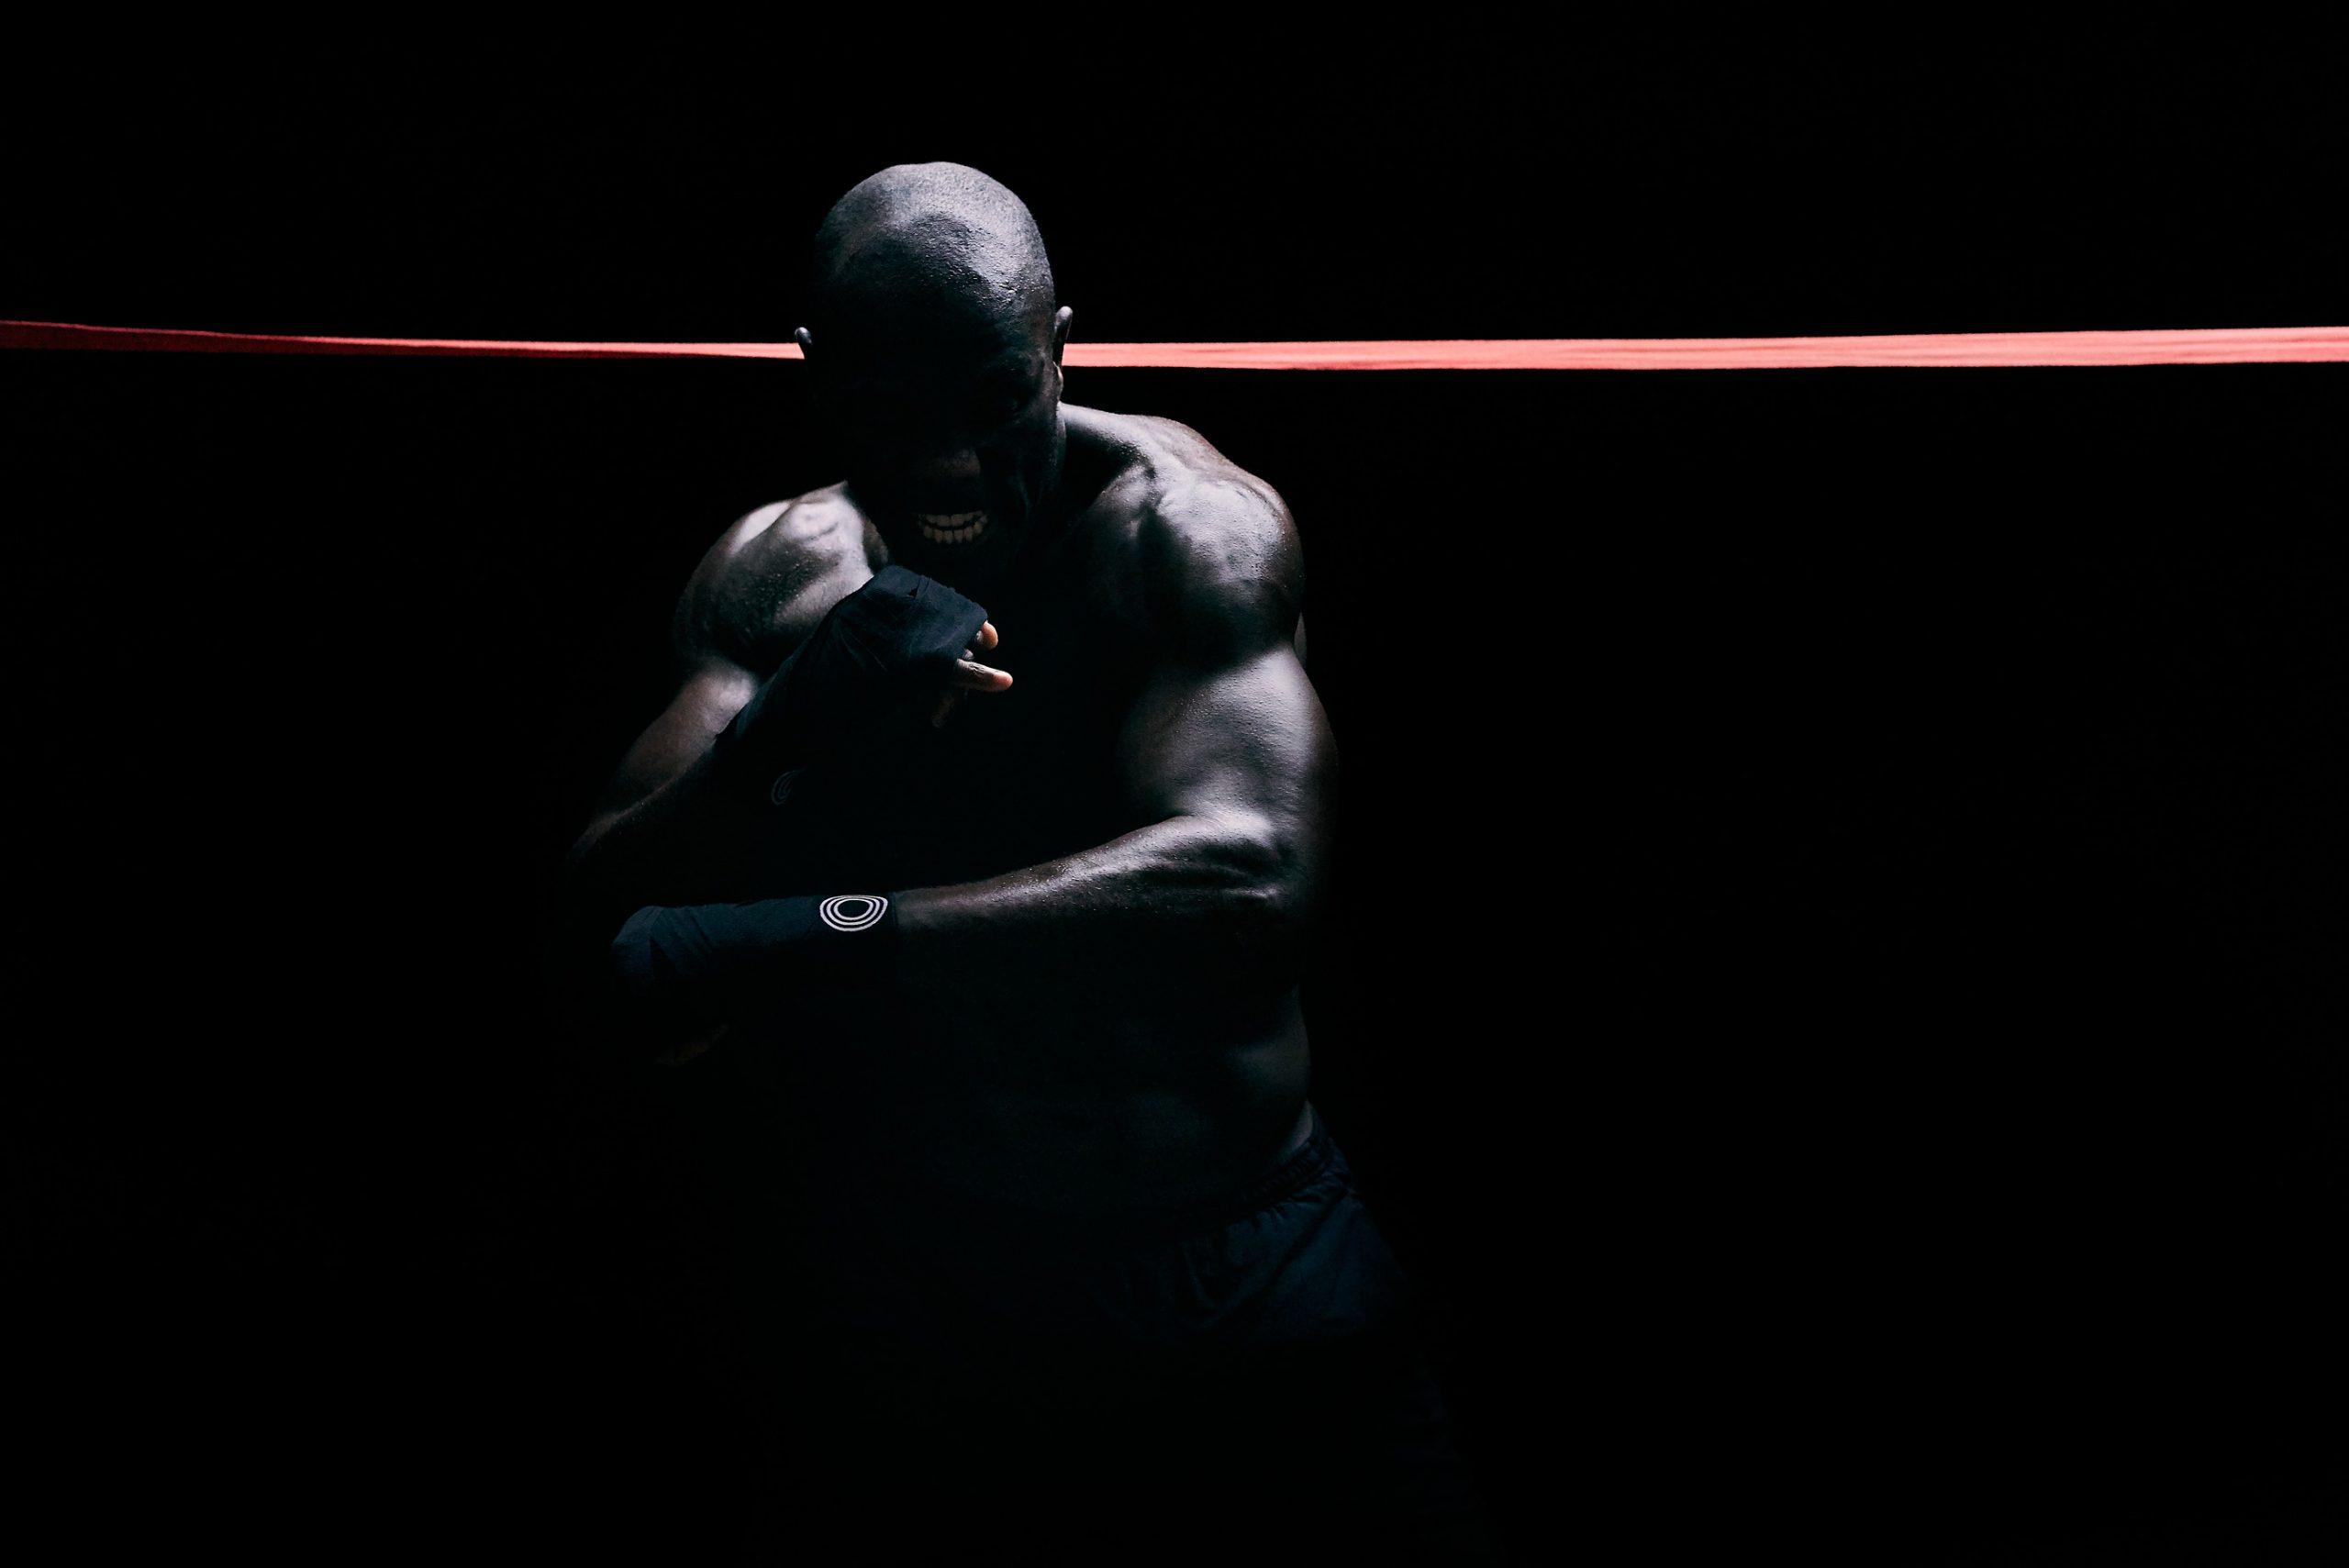 Stefano_Boxer-Video69497